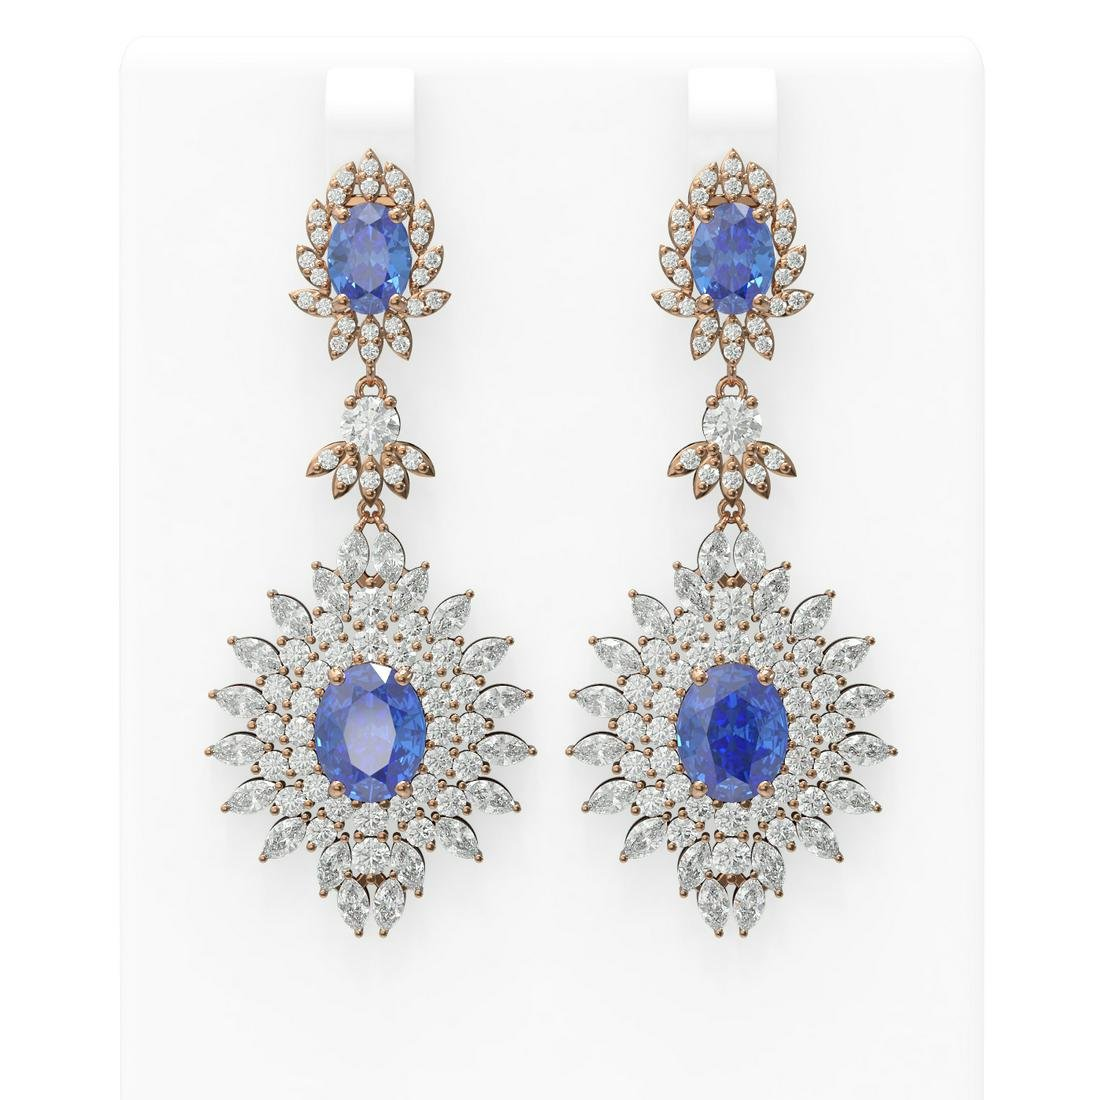 20.94 ctw Tanzanite & Diamond Earrings 18K Rose Gold -